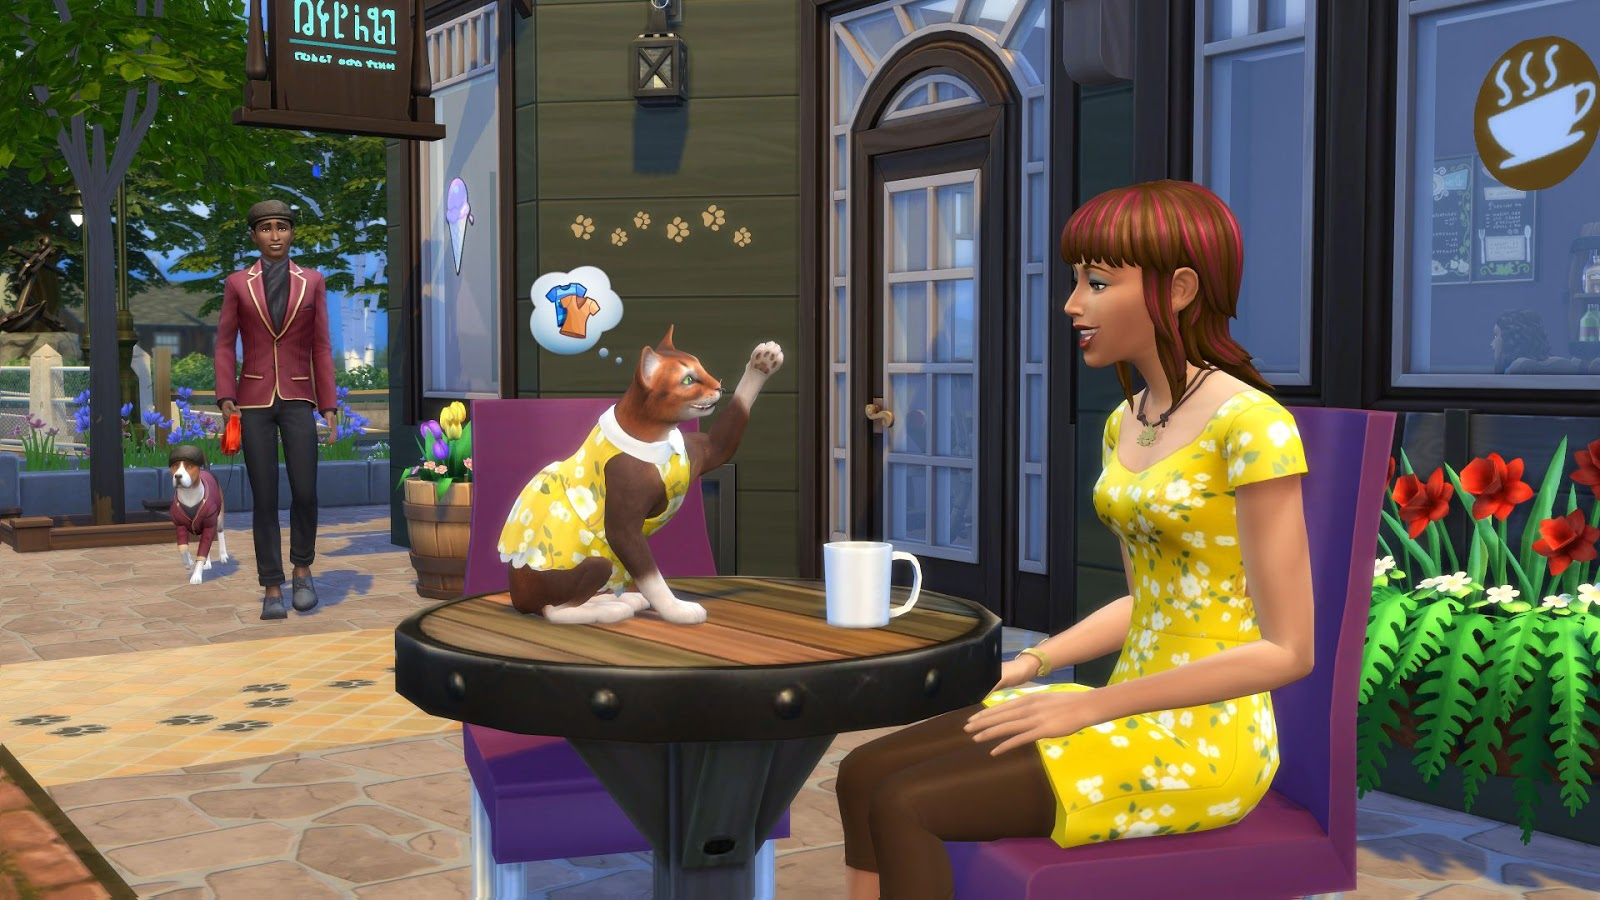 Los Sims 4 Mi Primera Mascota (CODEX) + REPACK PROPER 5 DVD5 + 1 ISO (JPW) 2